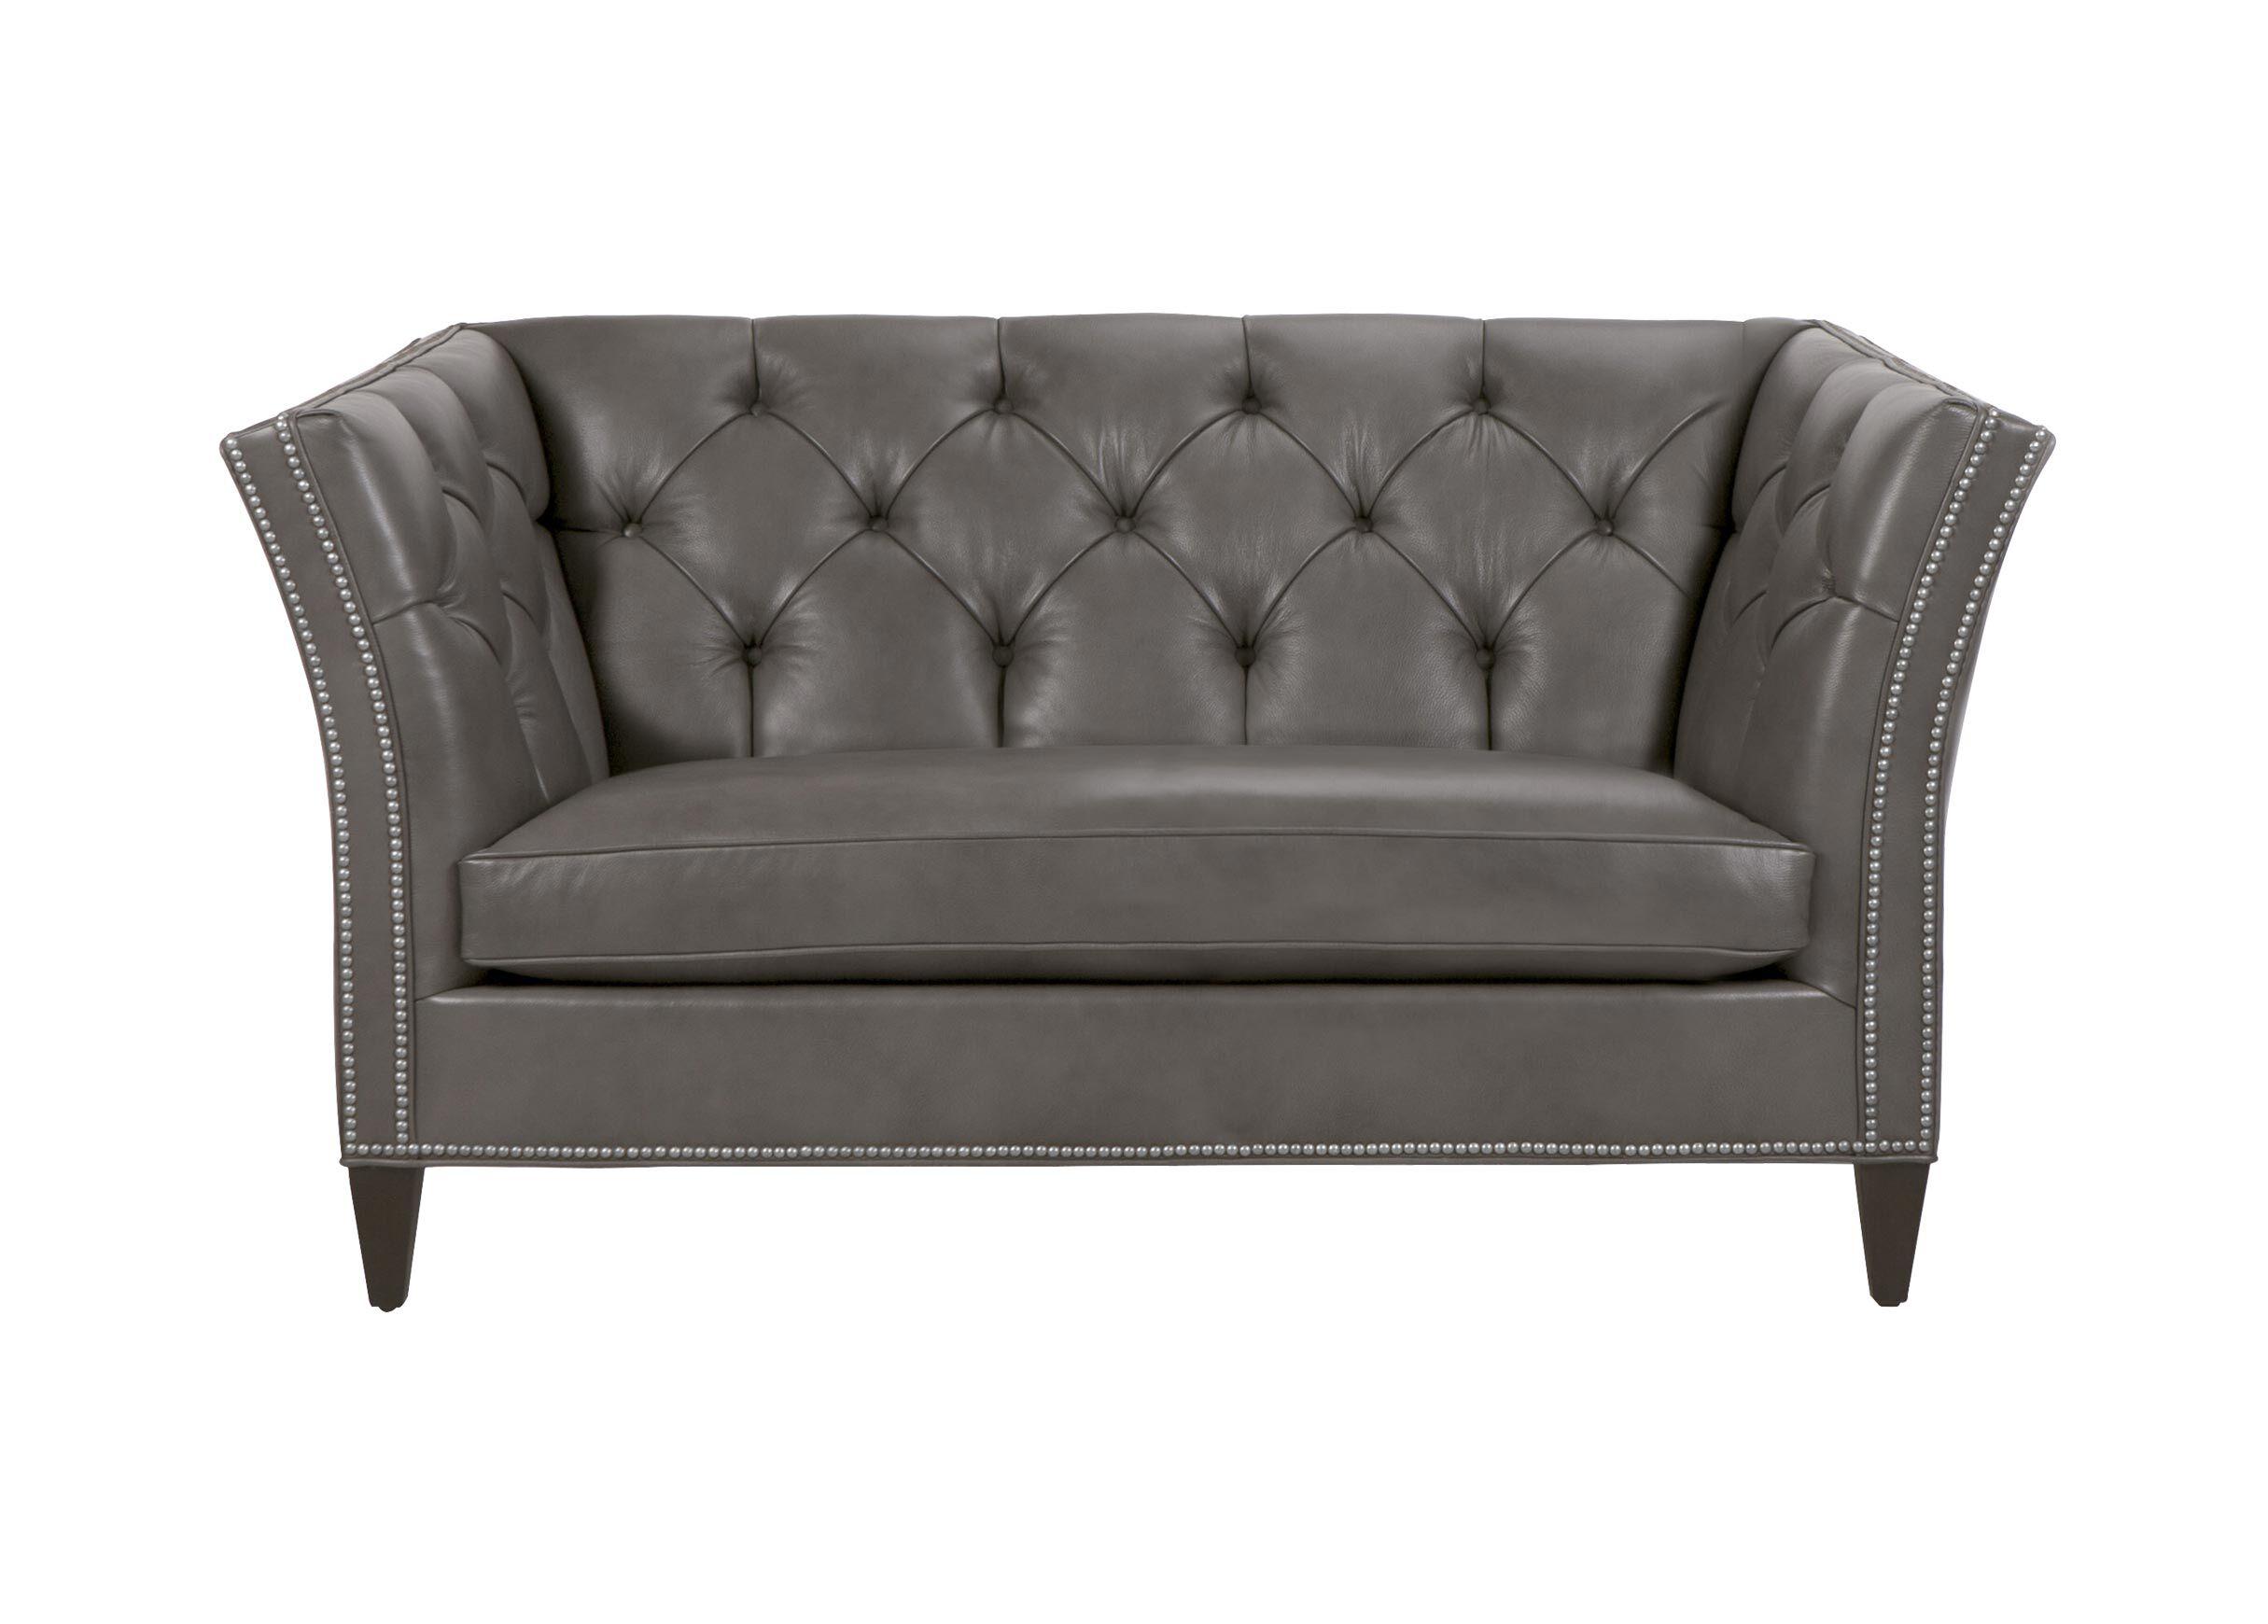 Shelton Leather Sofa Quick Ship Sofas Loveseats Ethan Allen